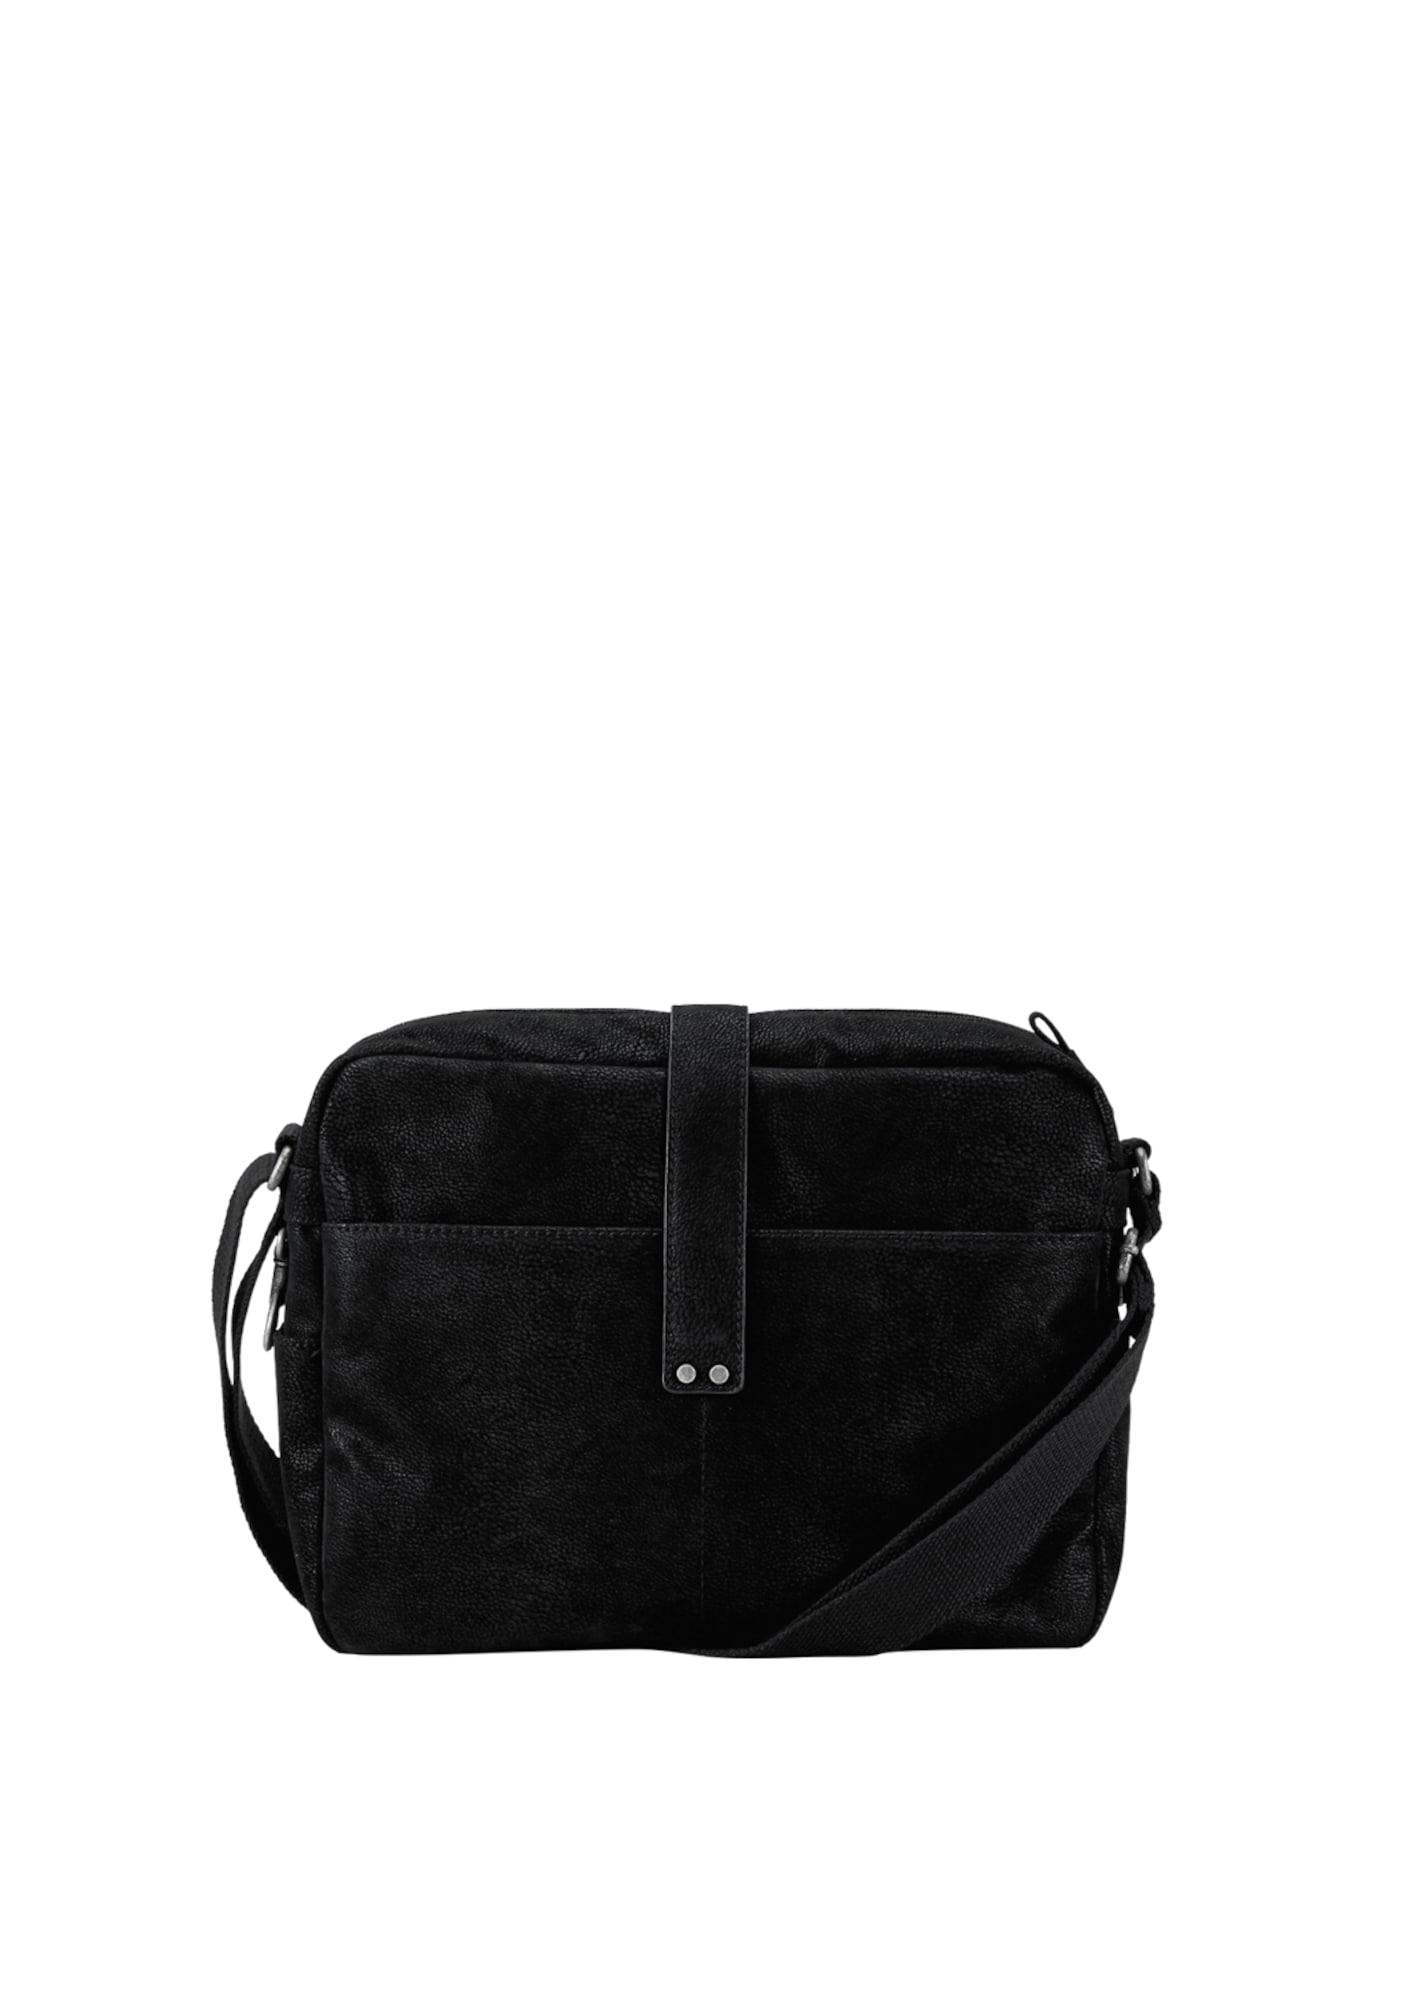 Messenger Bag   Taschen > Business Taschen > Messenger Bags   Schwarz   S.Oliver